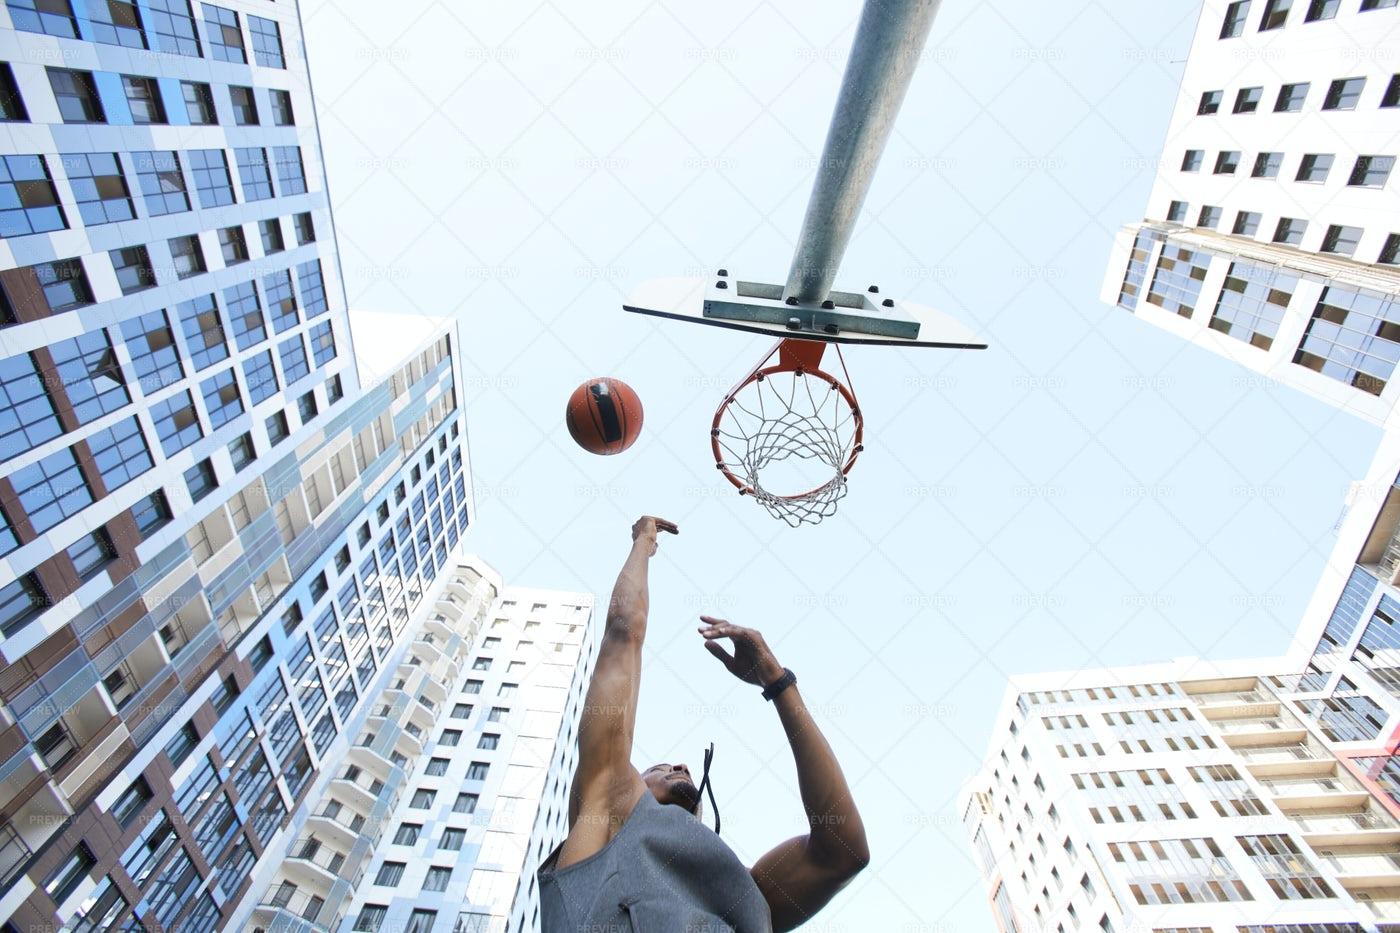 Urban Basketball Background: Stock Photos